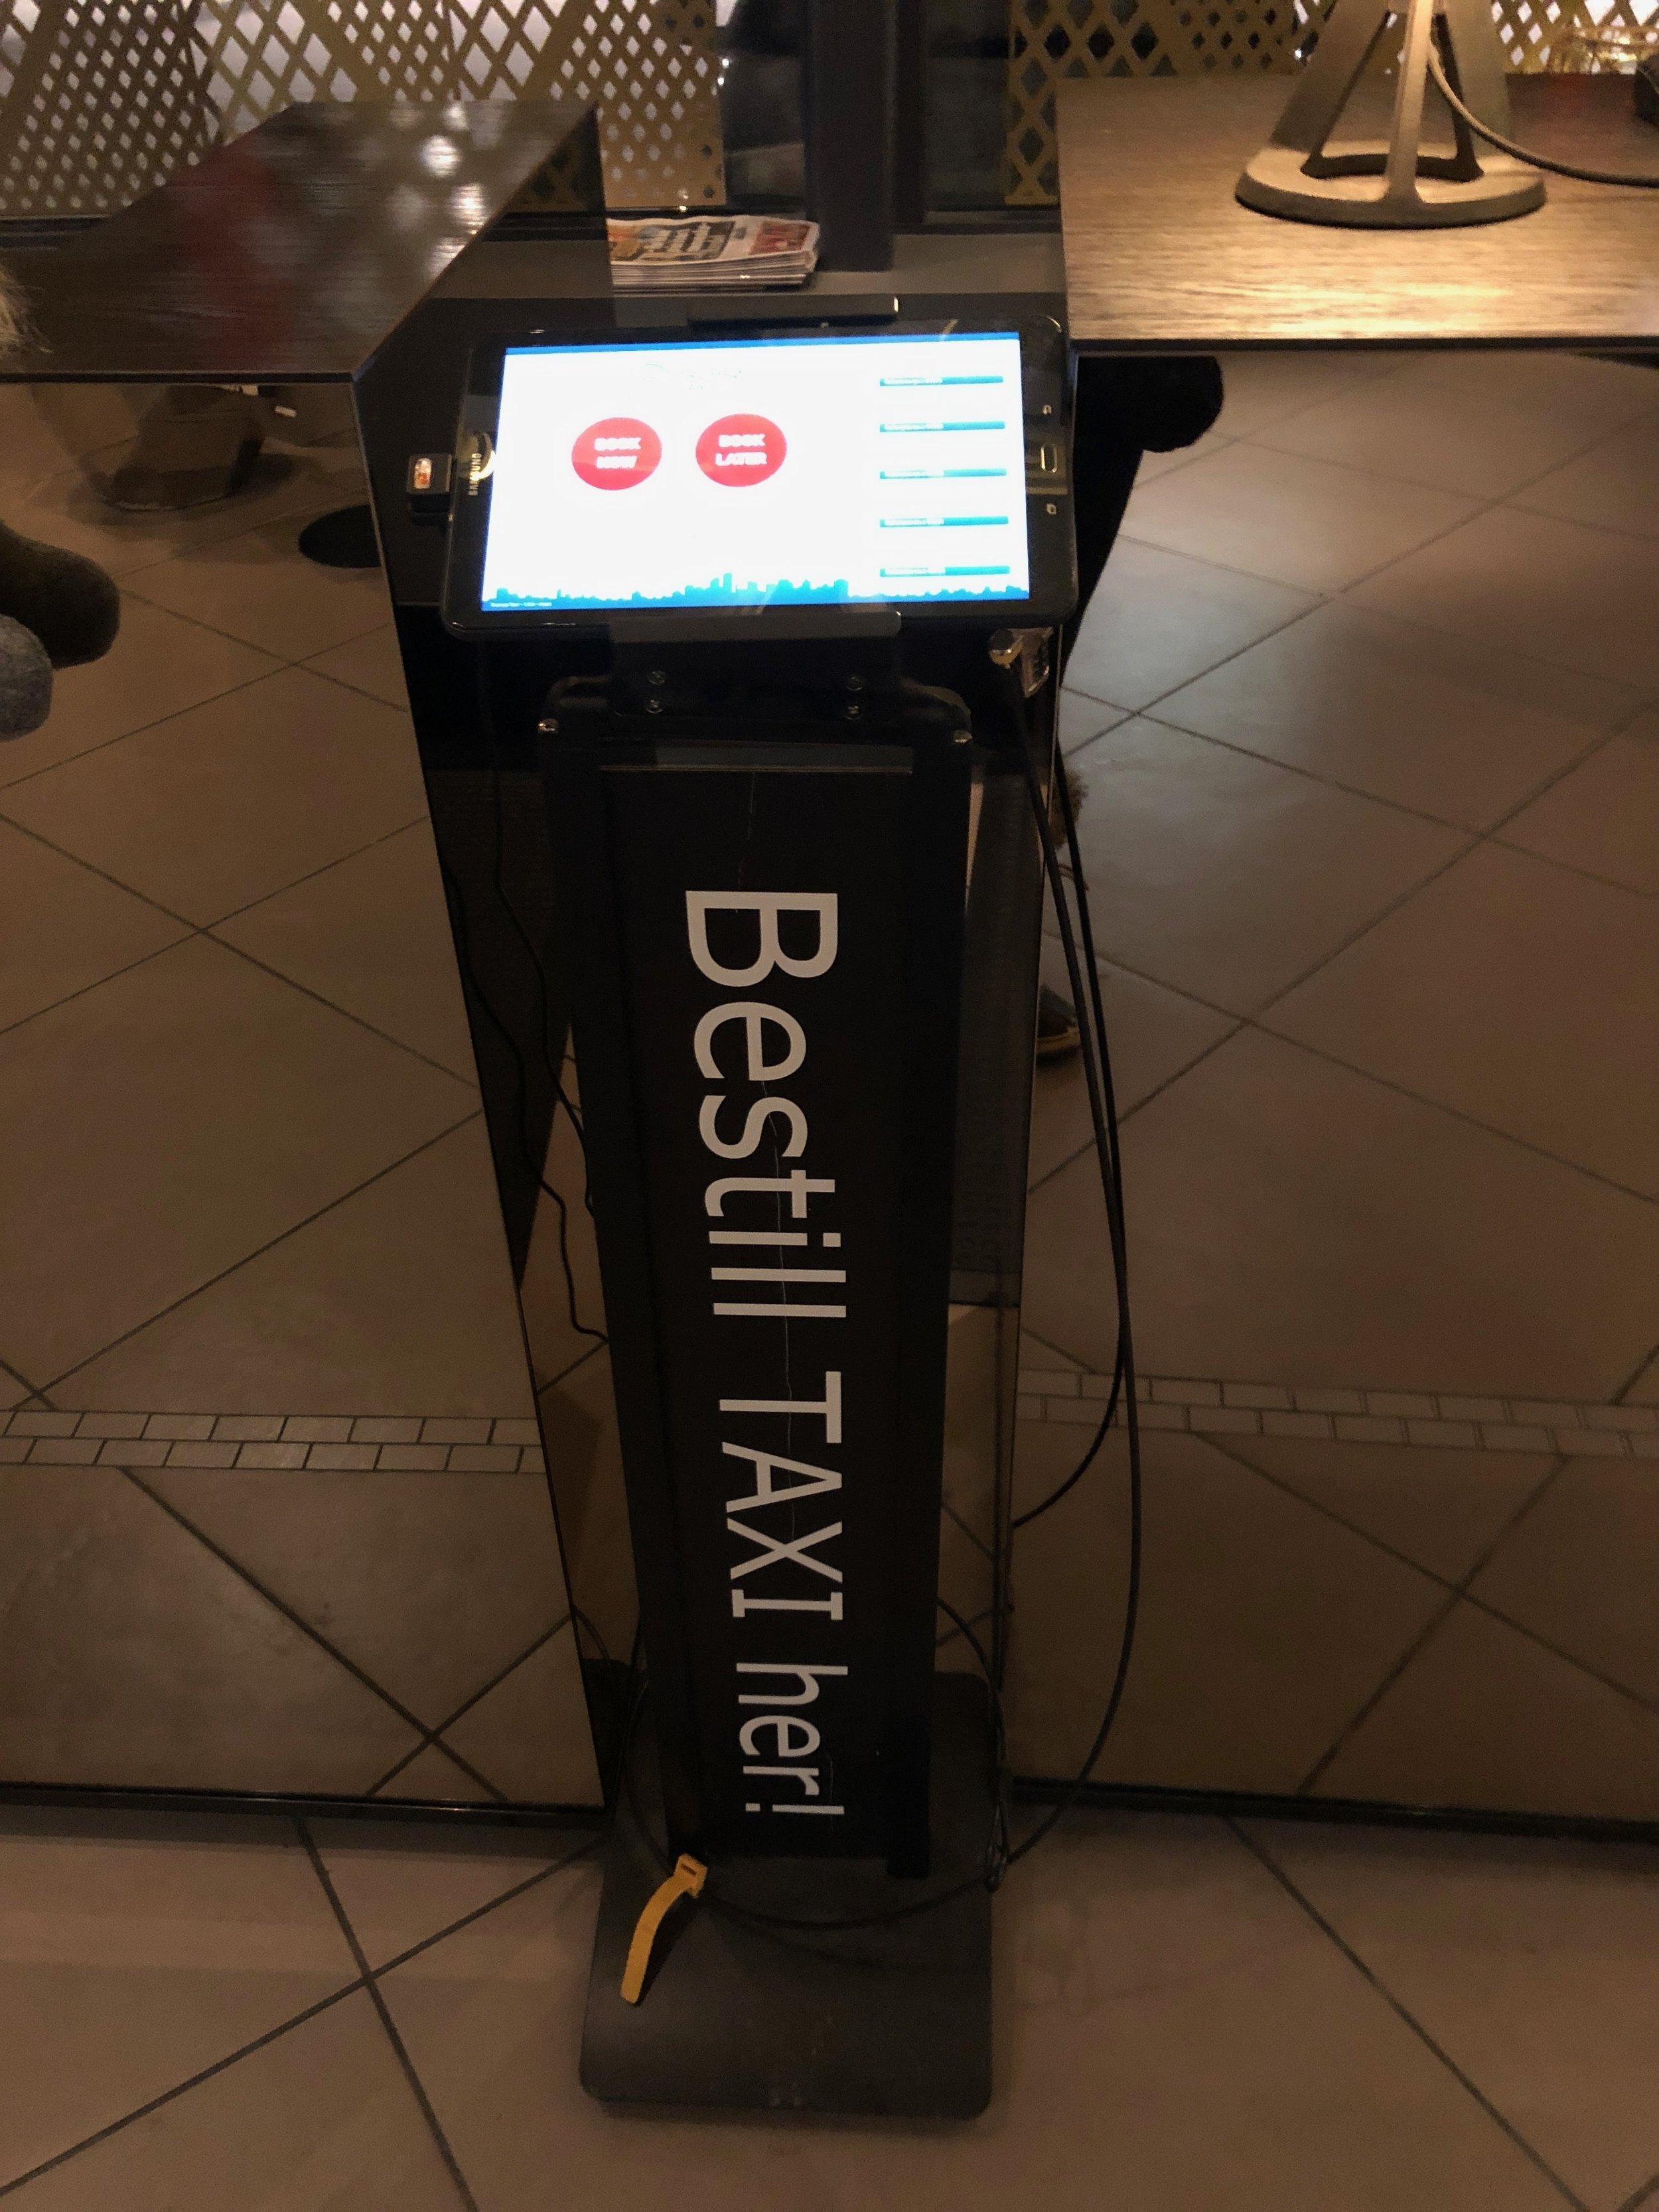 norway-taxi-kiosk-2.JPG